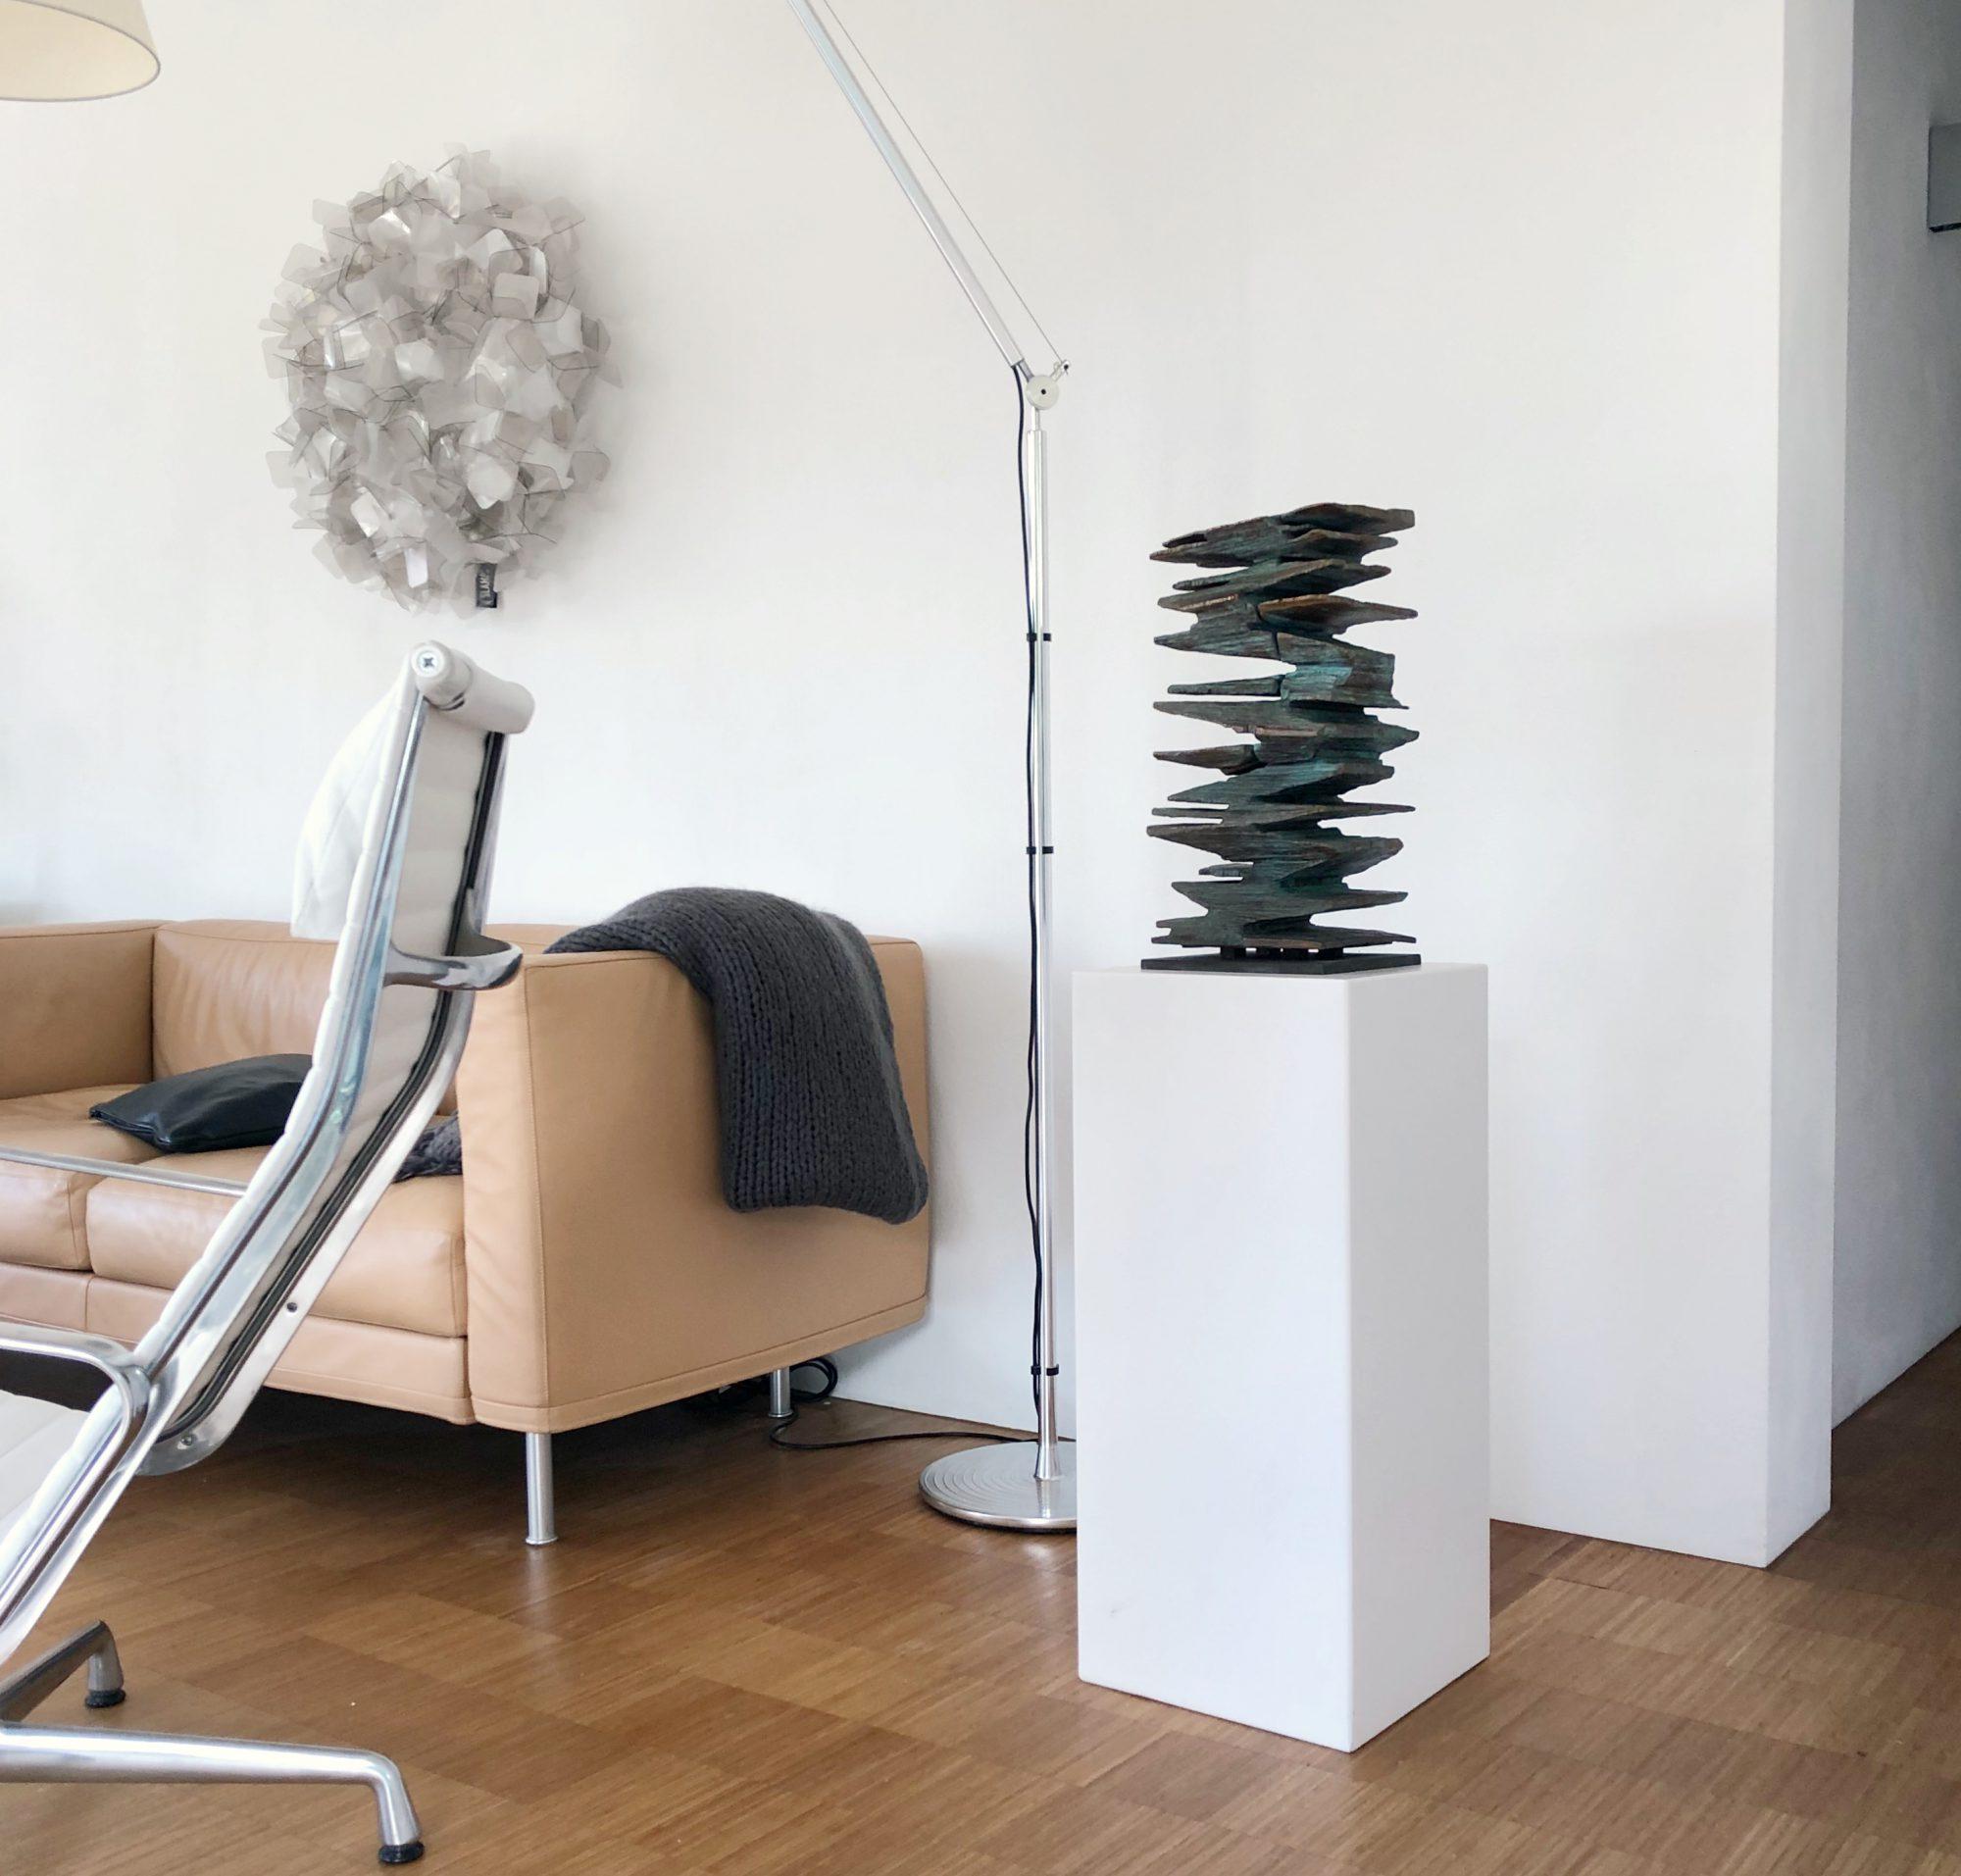 sylvio eisl | sculptures